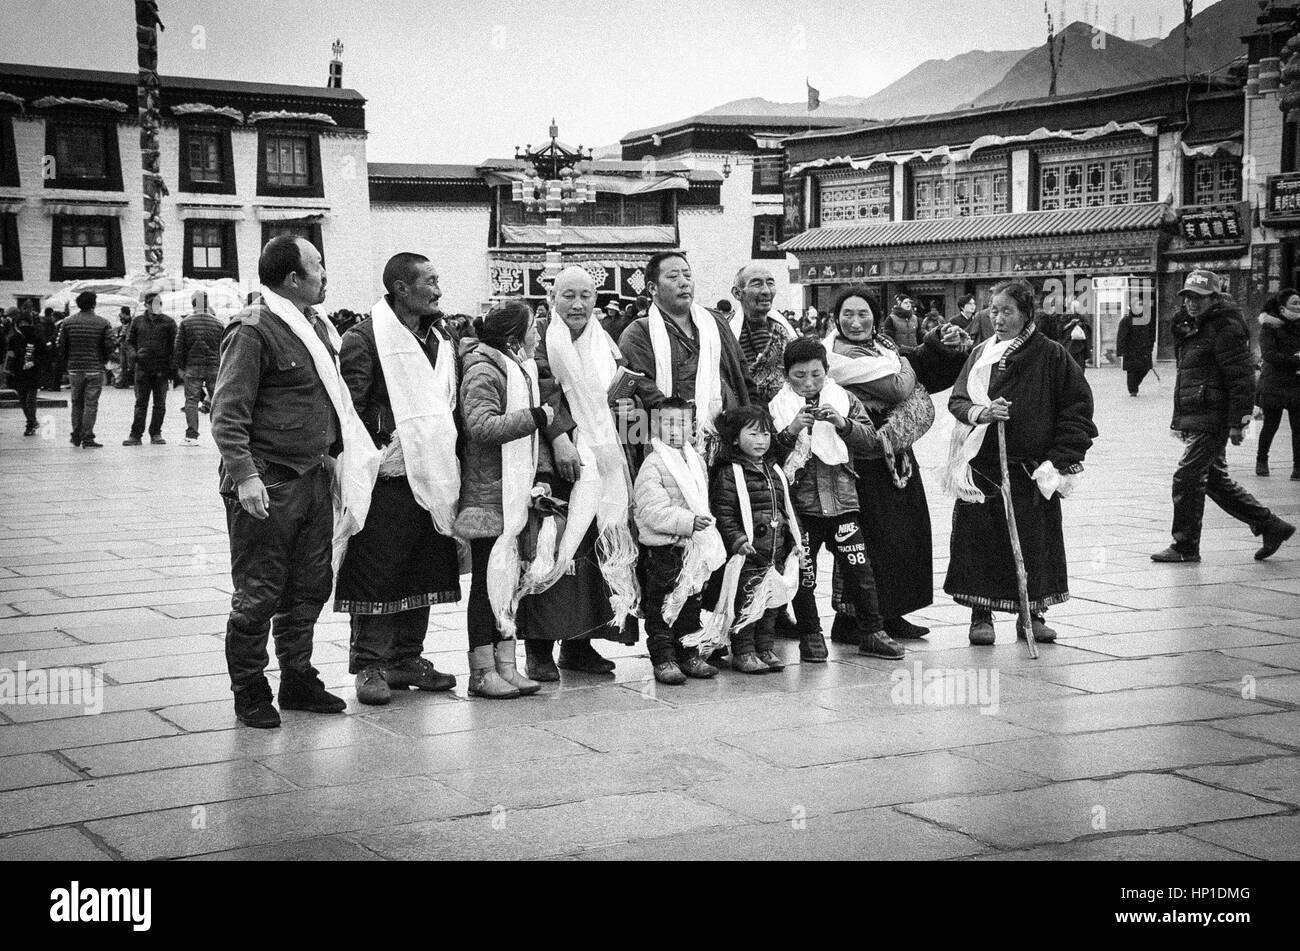 Tibet, Tibet, China. 17th Feb, 2017. Pious Buddhist pilgrims on their pilgrimage in southwest China's Tibet Autonomous Stock Photo